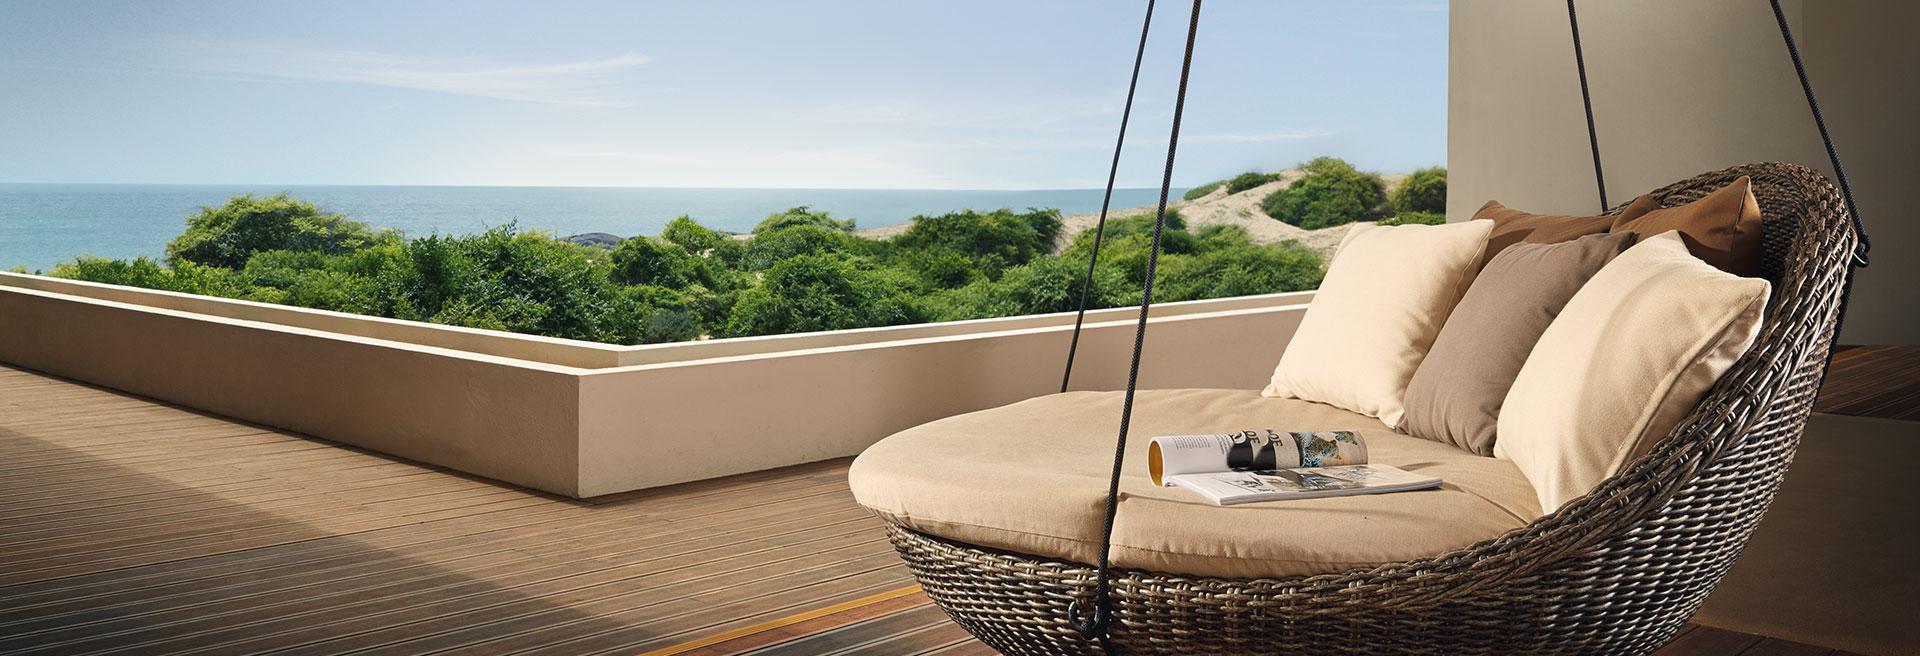 Outdoor hammock chair facing the sea